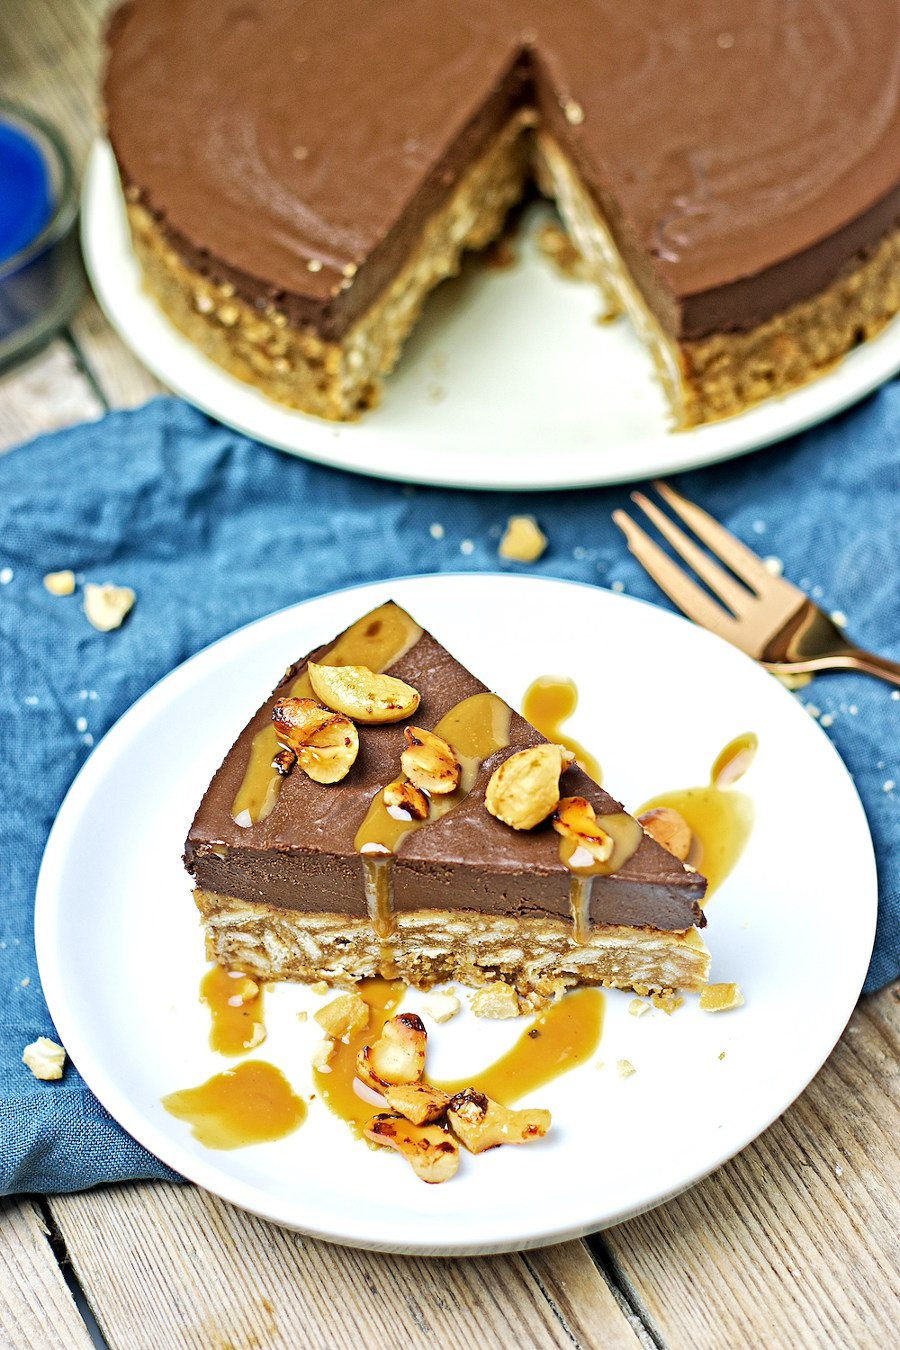 Vegan Chocolate Cake #vegan #glutenfree www.contentednesscooking.com